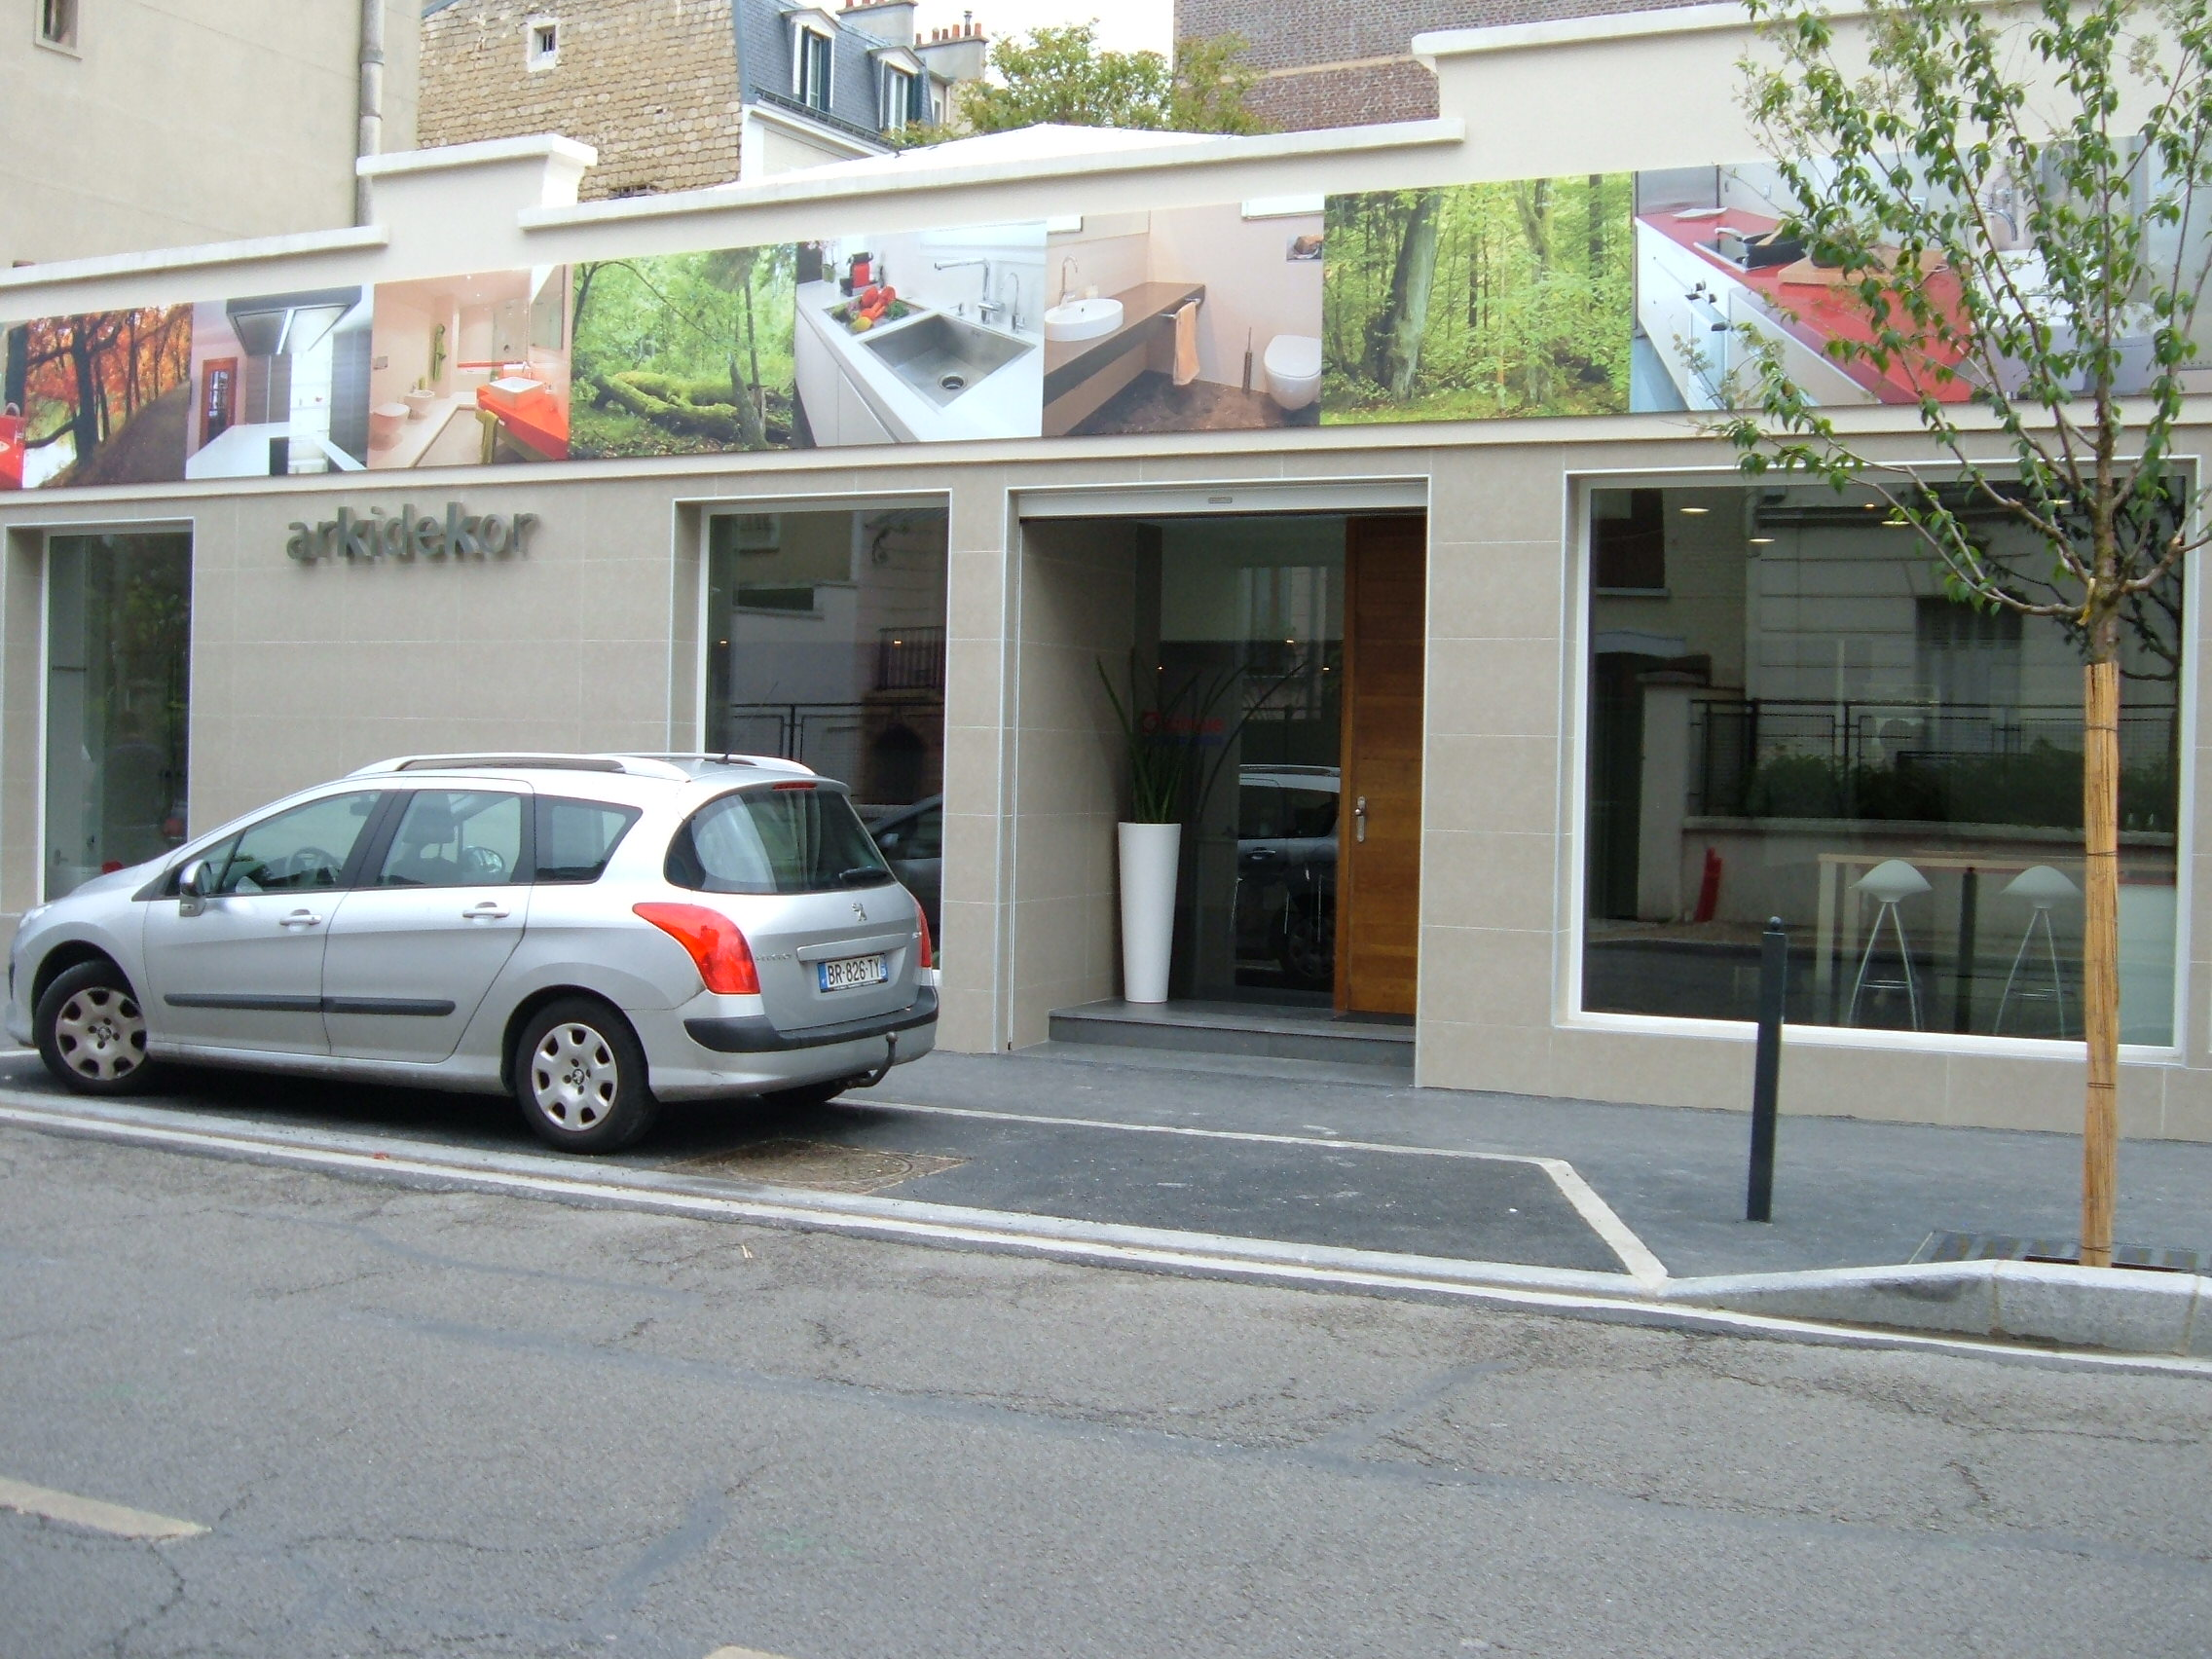 Nuovo punto vendita Gicinque a Parigi